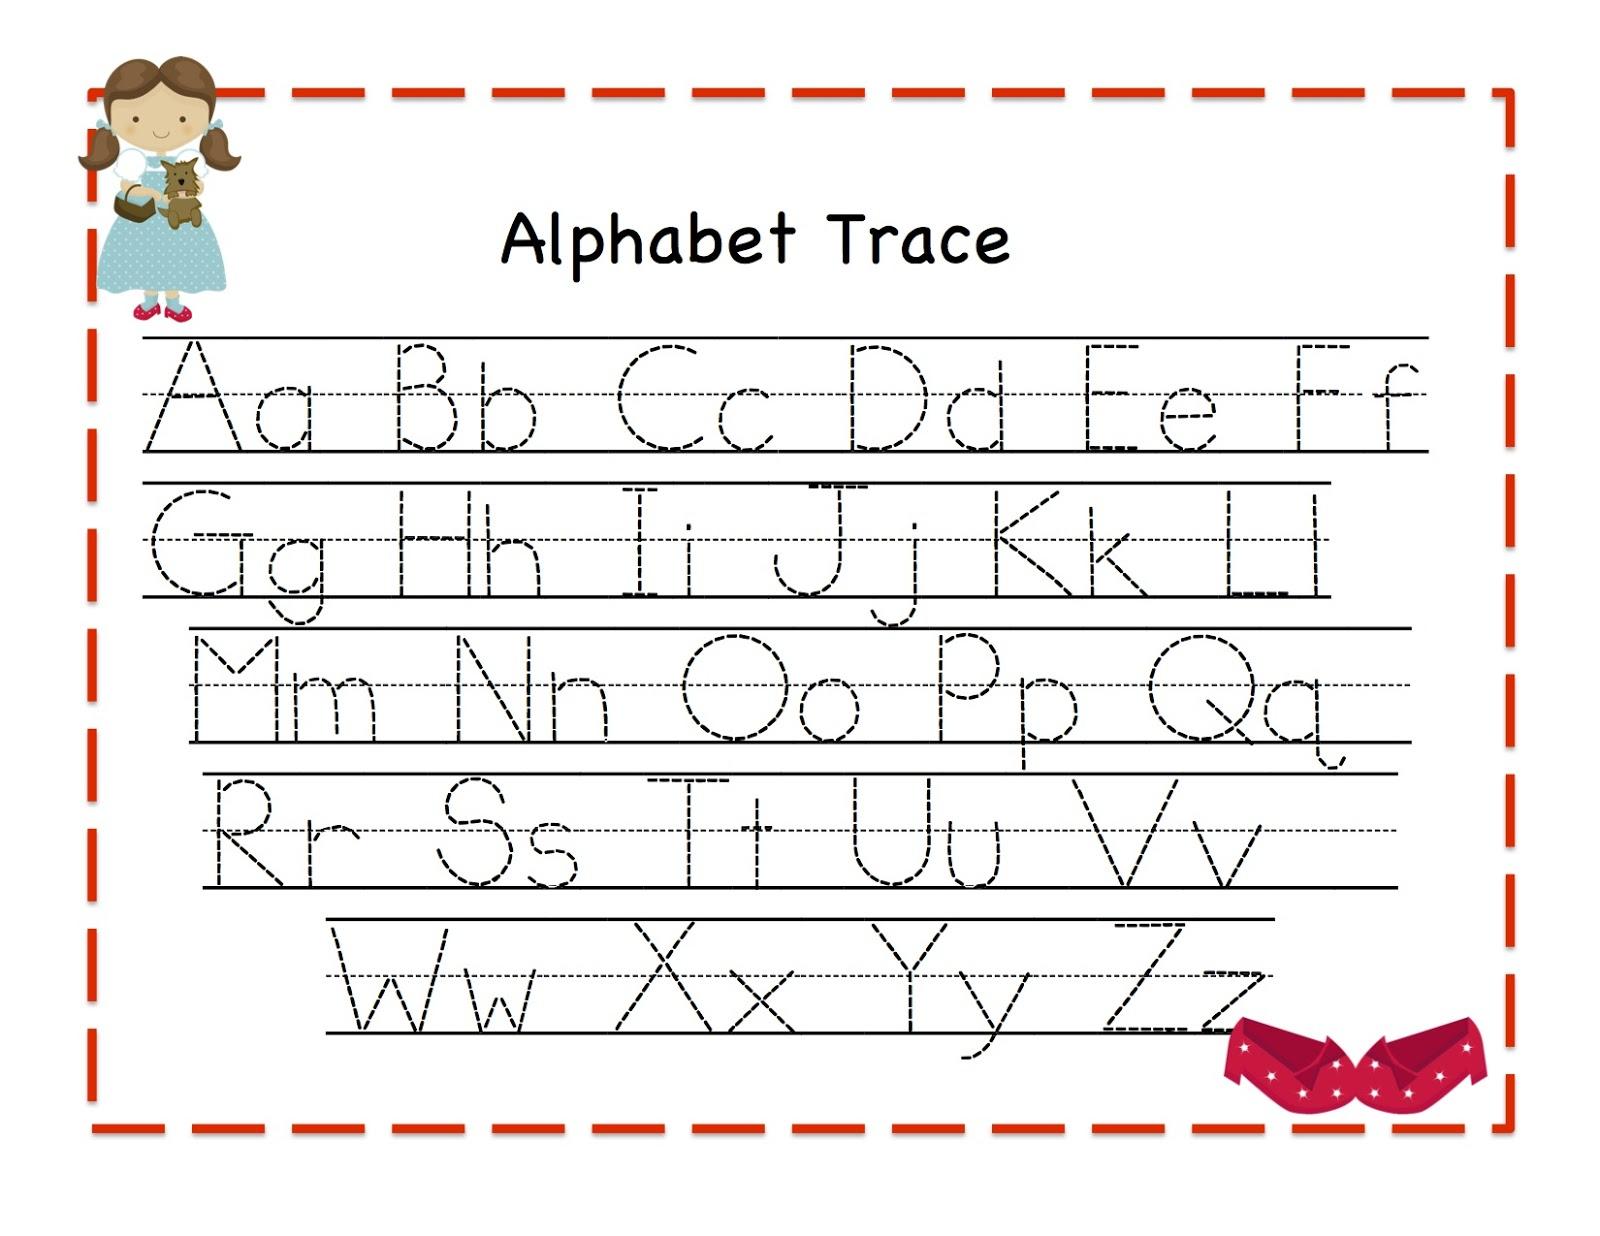 Free Alphabet Tracing Templates ] - Tracing Letters Template with Tracing Letters Template Free